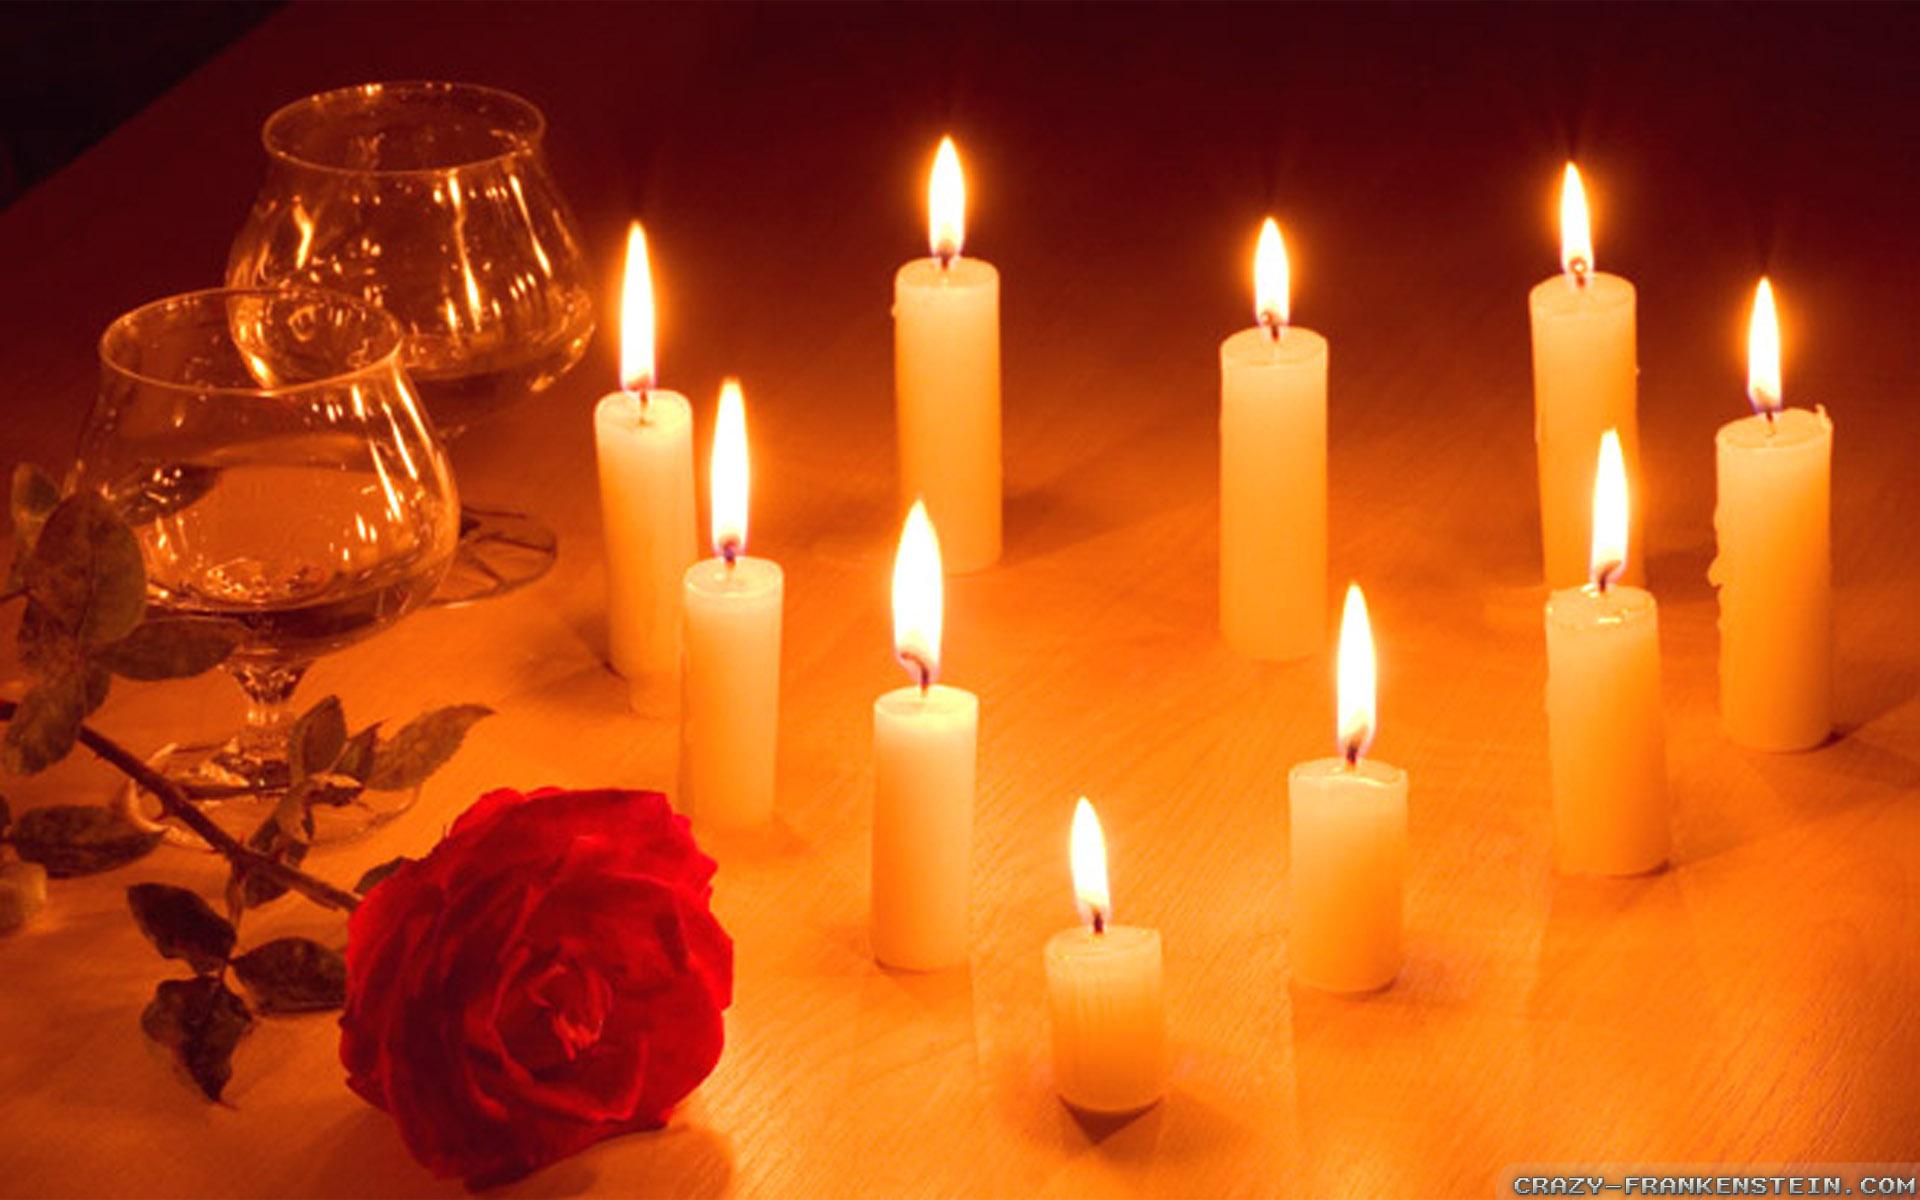 magical romantic candles wallpapers 1920x1200 BlogDailyHerald 1920x1200